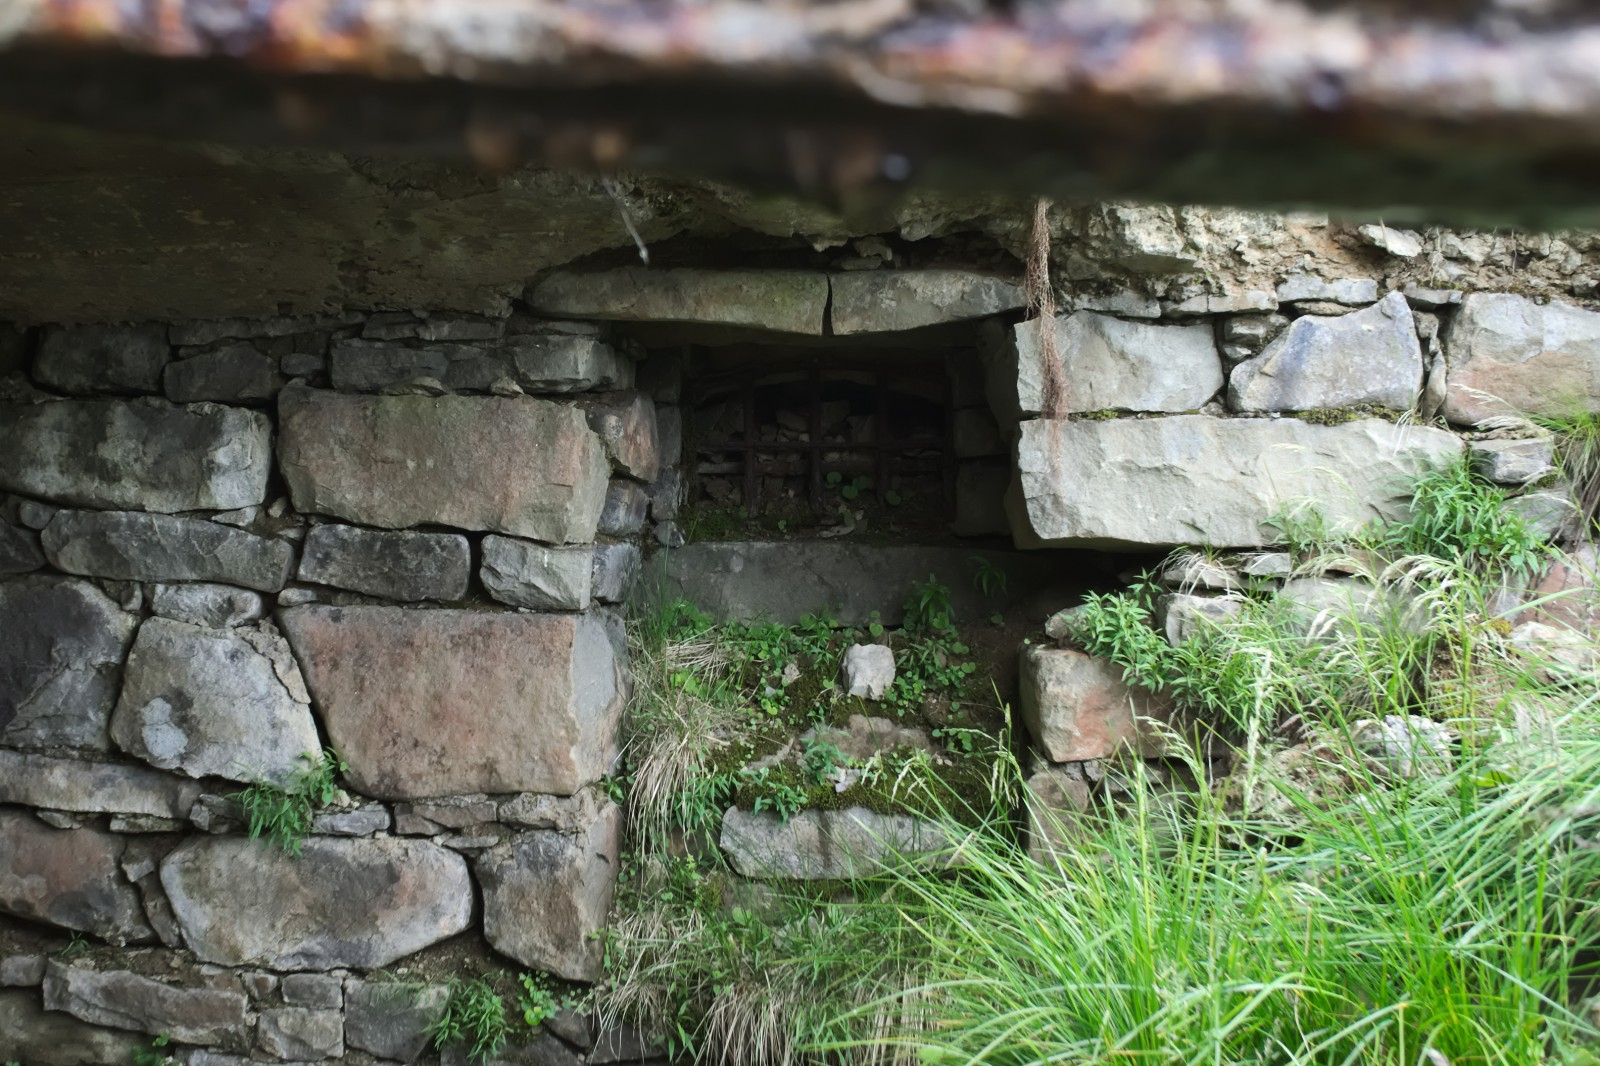 Ruiny schroniska Beskidenverein 1905-1949